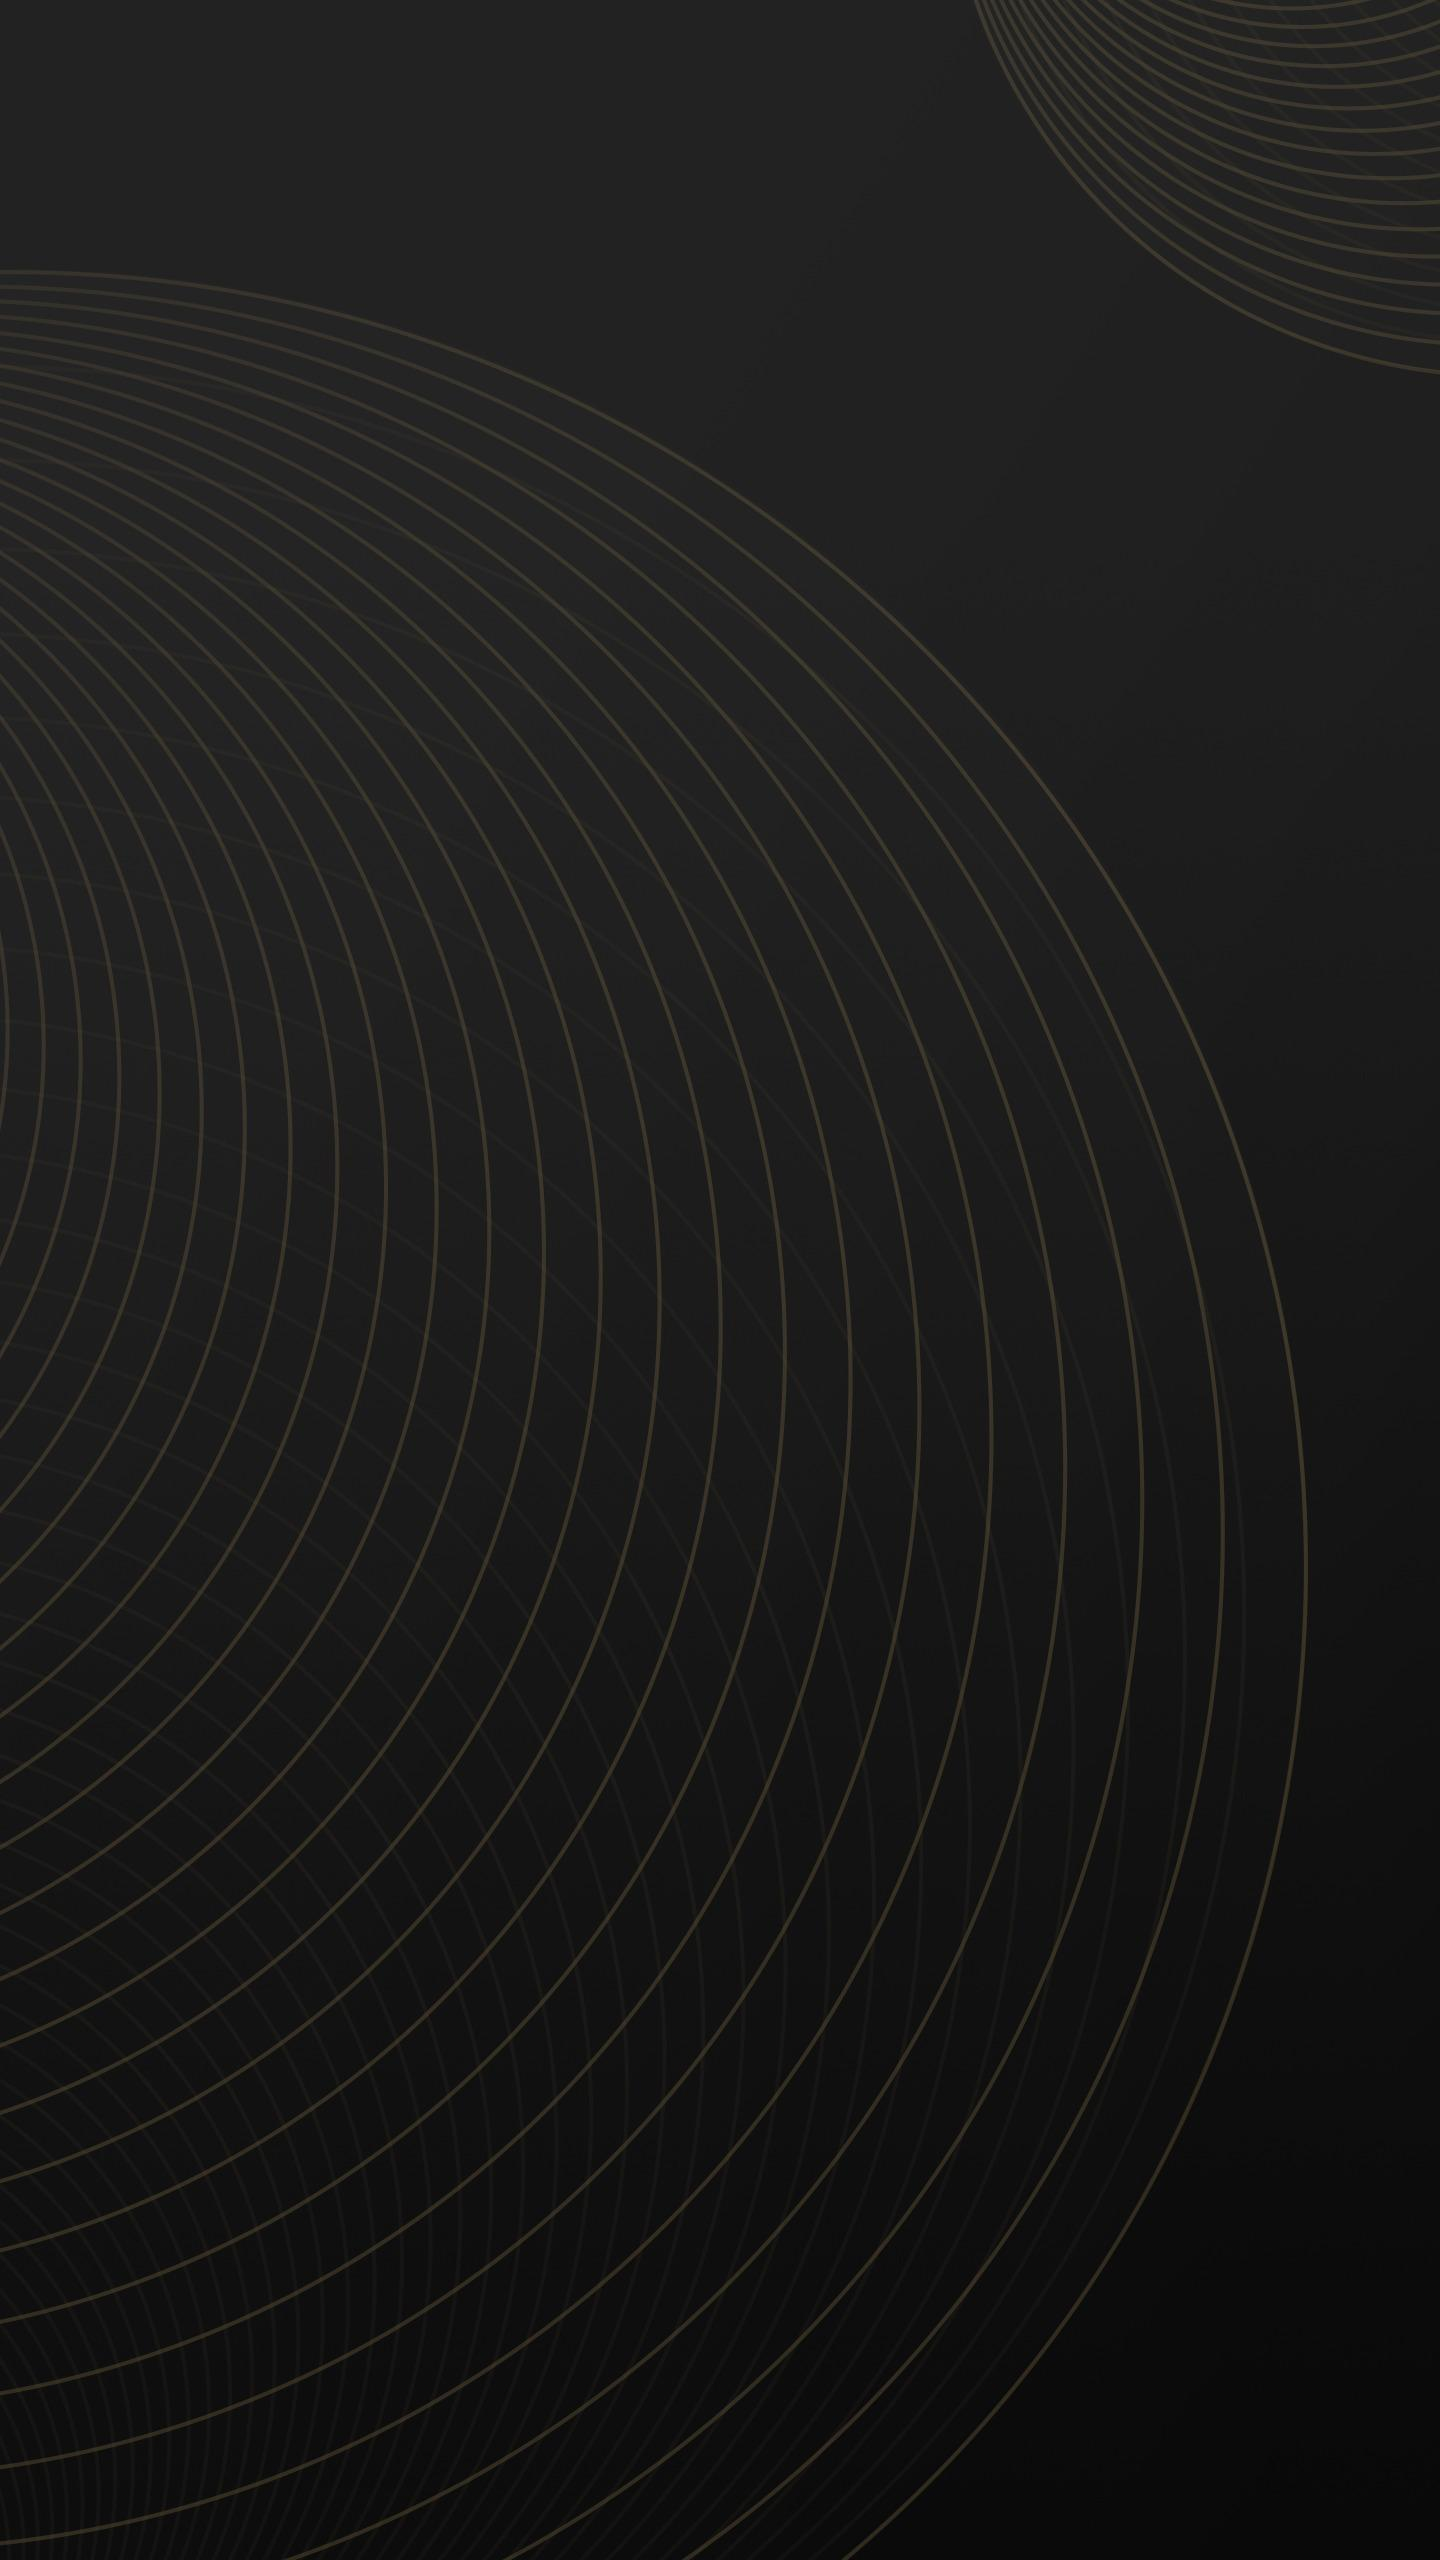 Huawei Black Wallpapers Top Free Huawei Black Backgrounds Wallpaperaccess